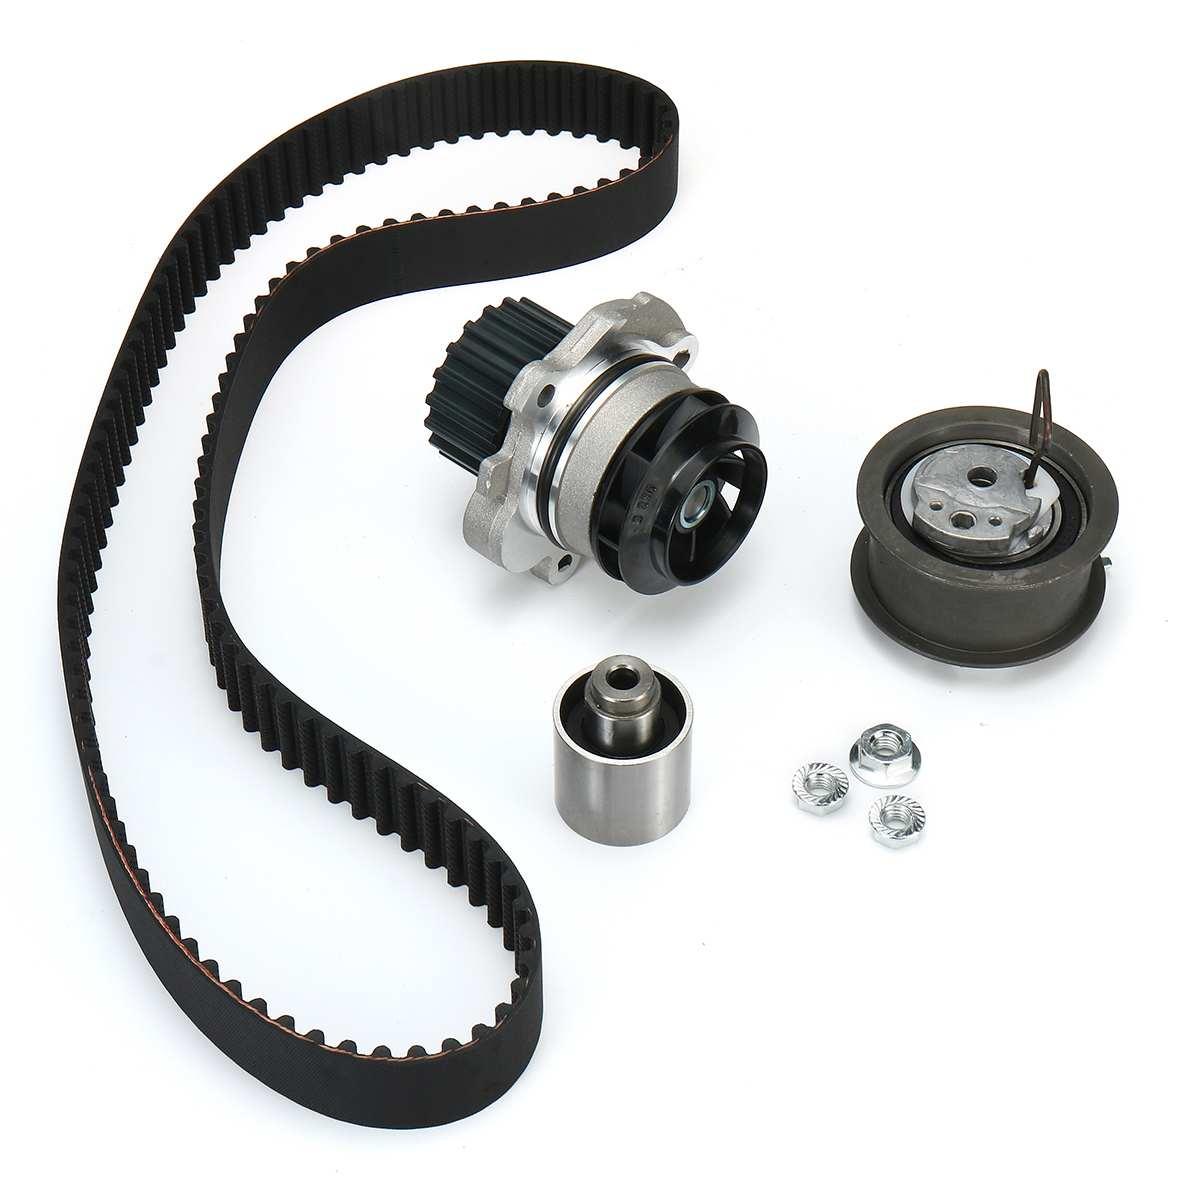 Water Pump + Engine Timing Belt Tensioner Set For Audi A3 A4 A6 ForVW For GOLF For PASSAT 1.9/2.0 TDi 1131812 1221490